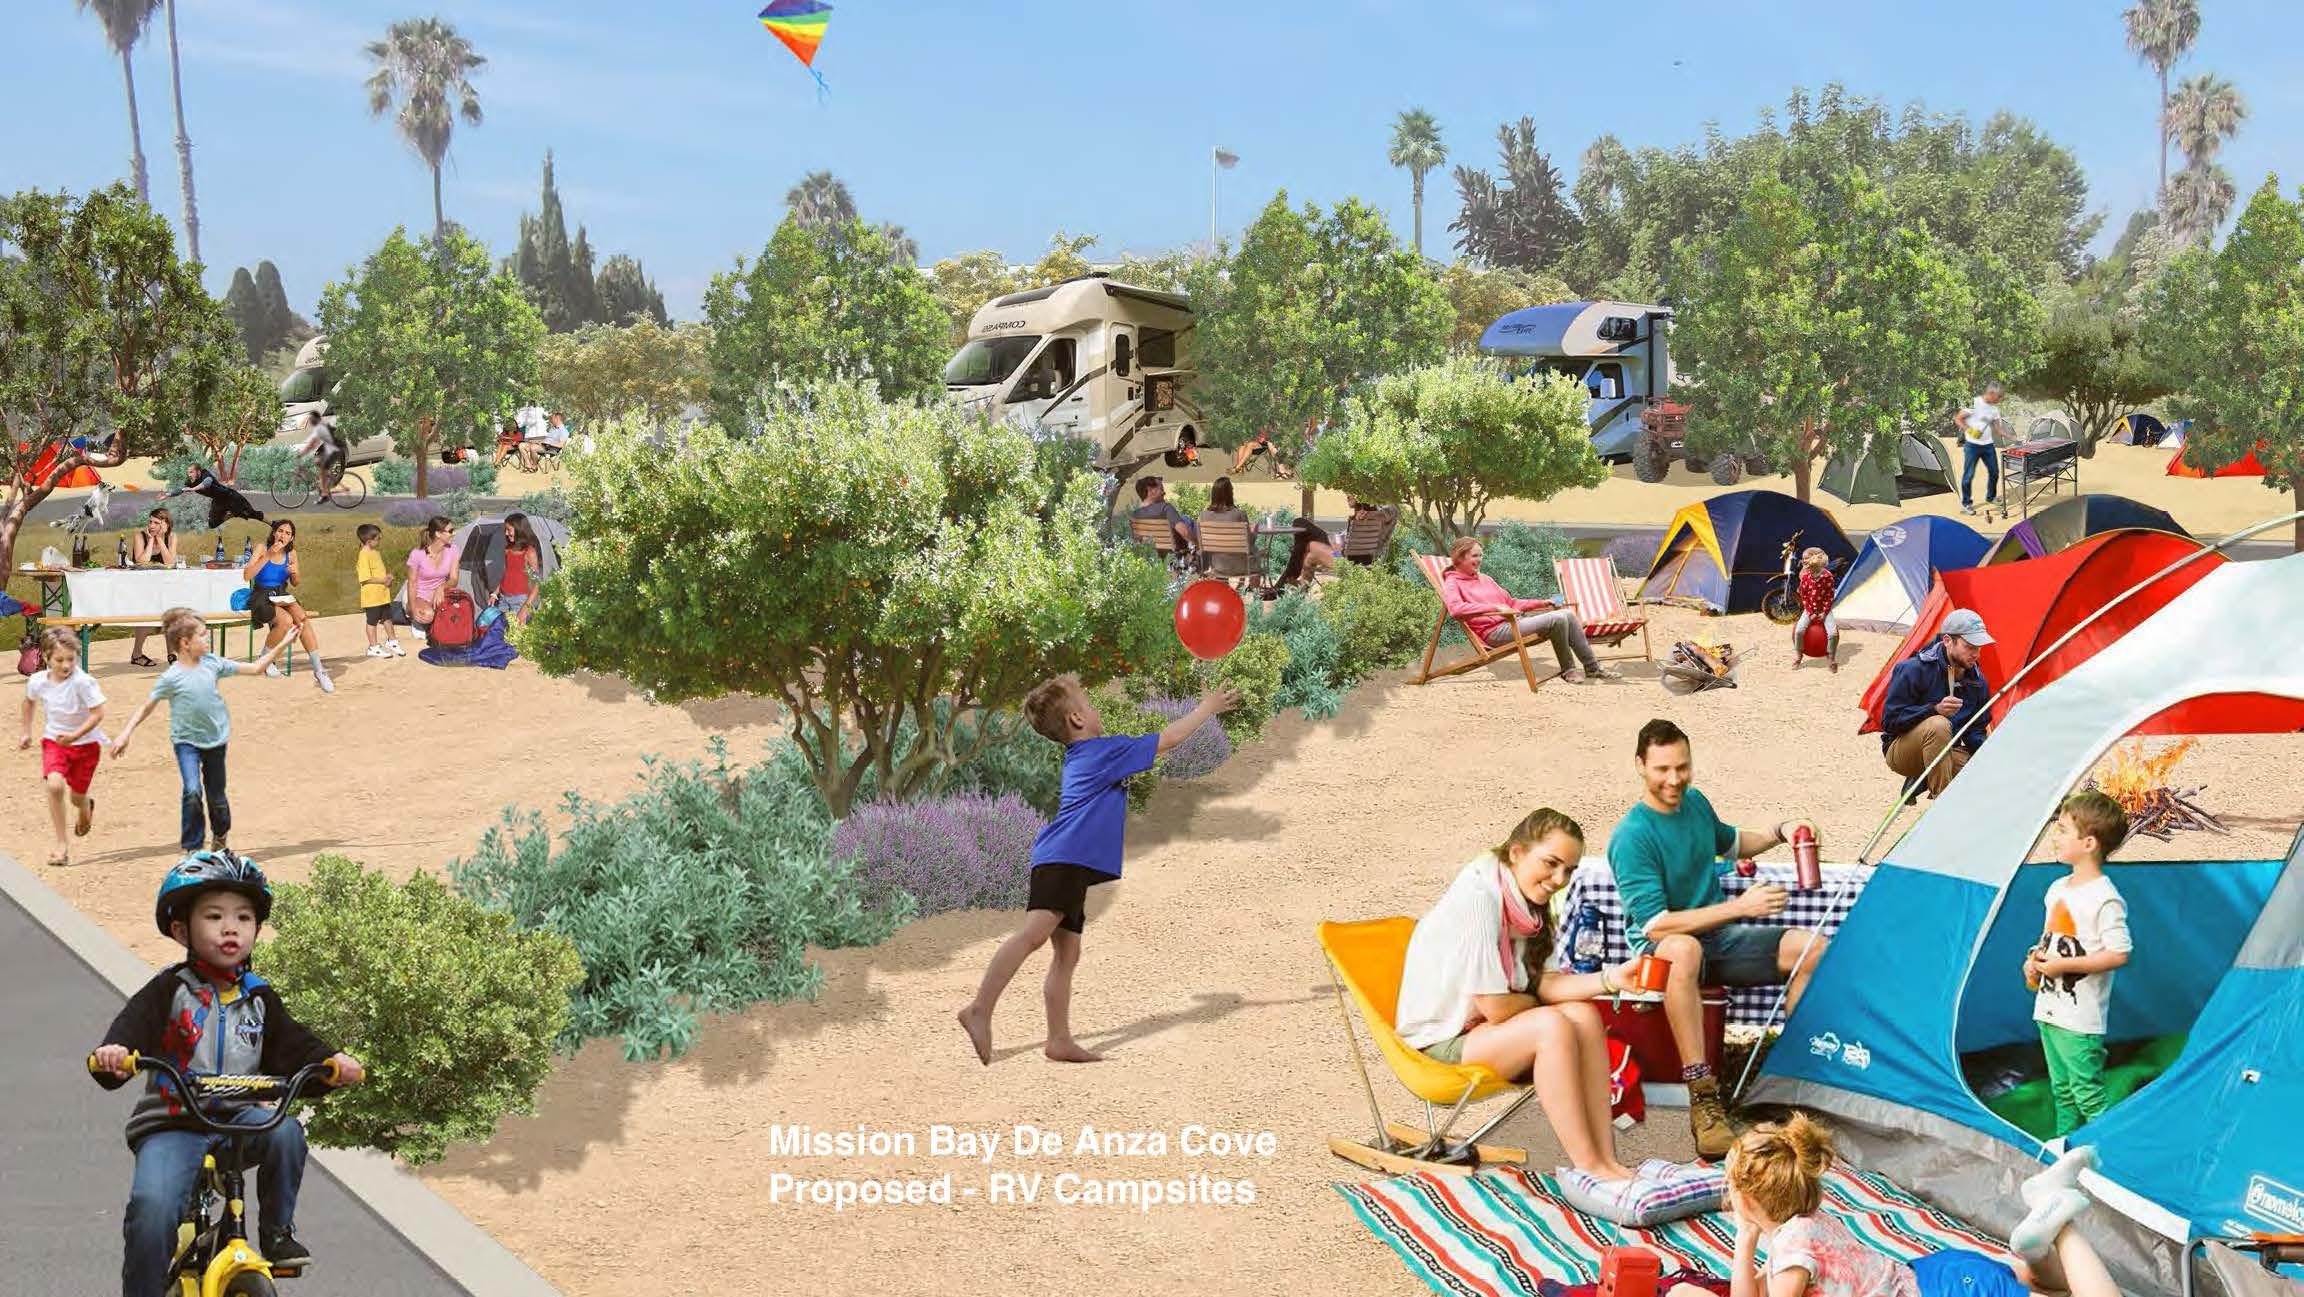 proposed camping at De Anza Cove